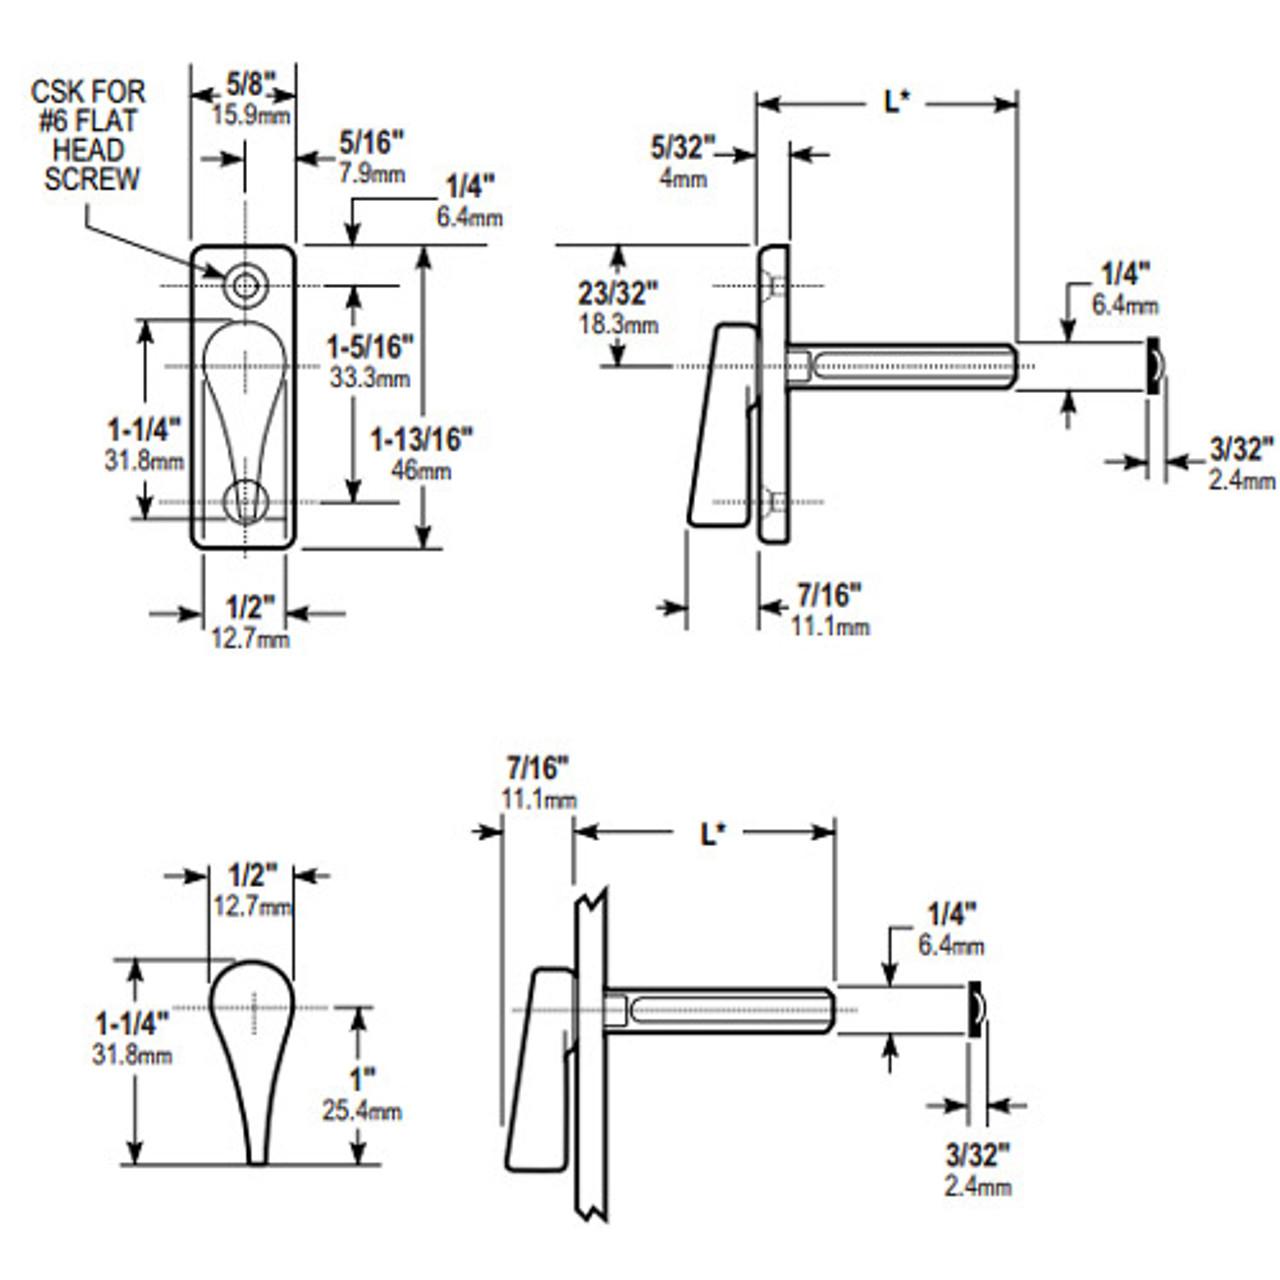 1000-21-29-119 Adams Rite 1000 Series Turns Dimensional View